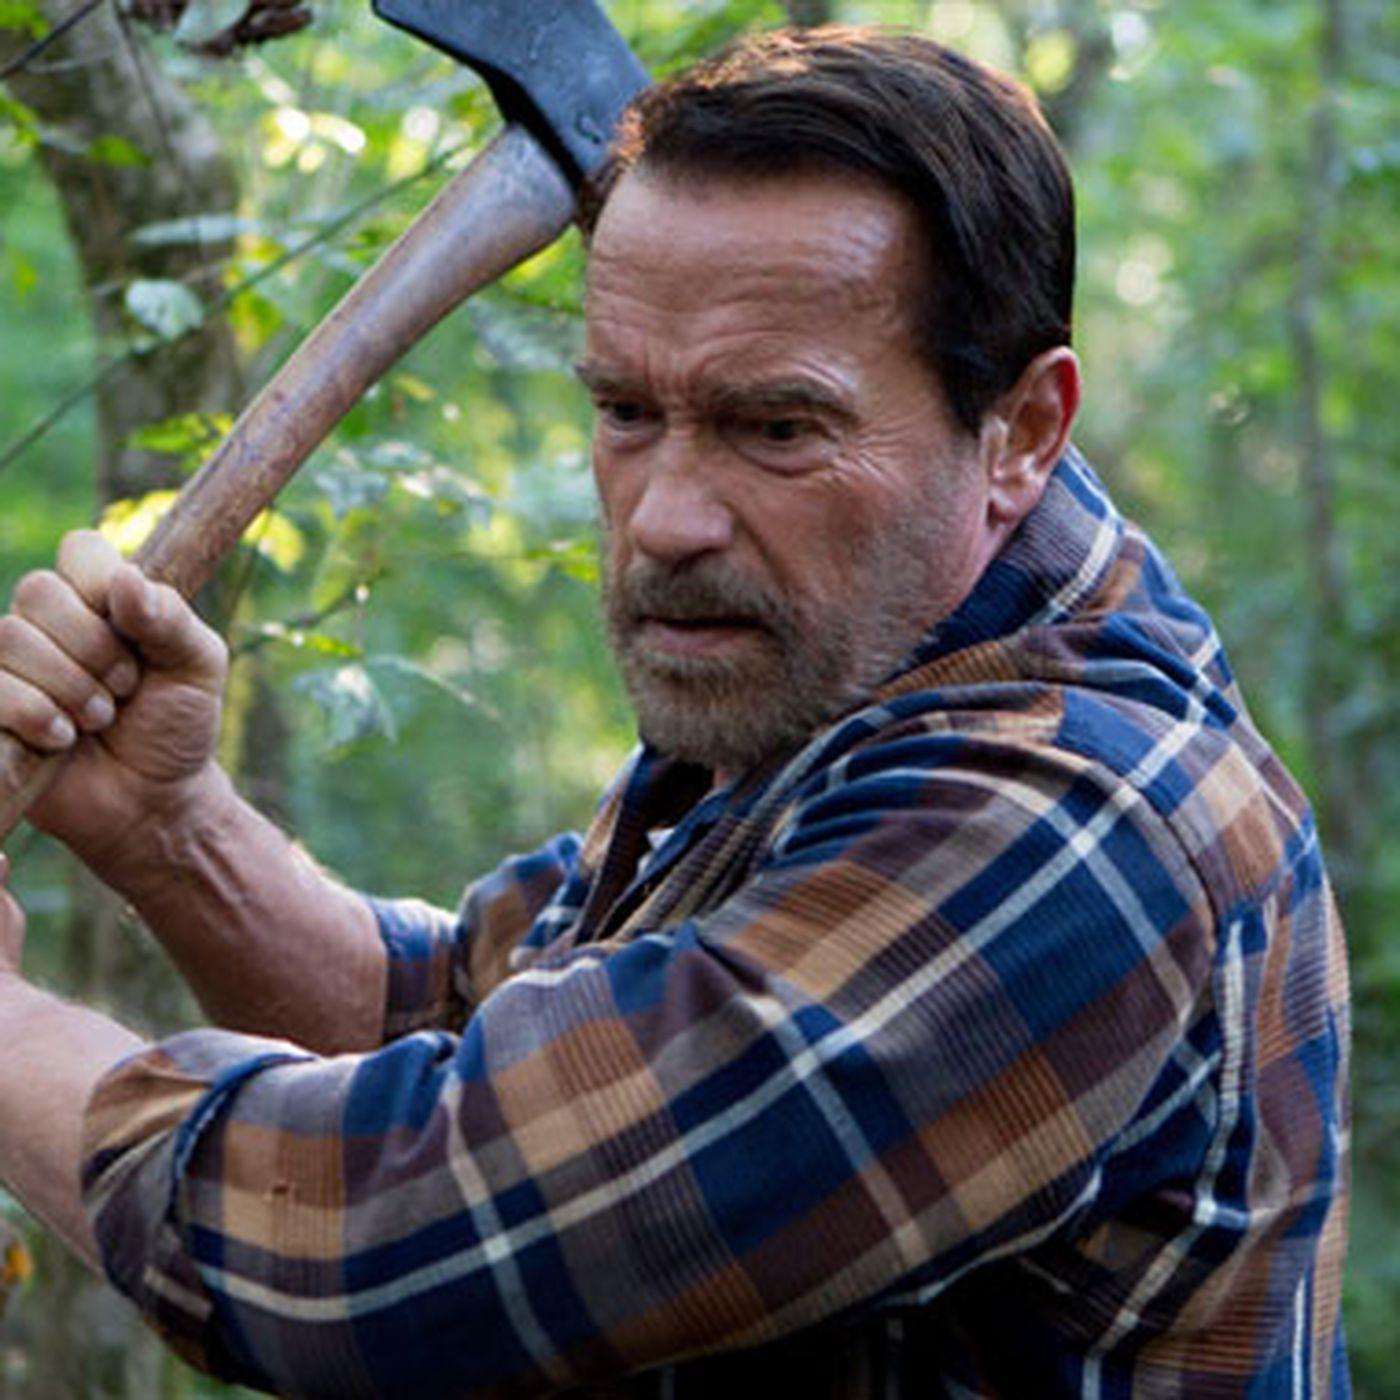 Arnold Schwarzenegger in Contagious - Epidemia mortale (Maggie)